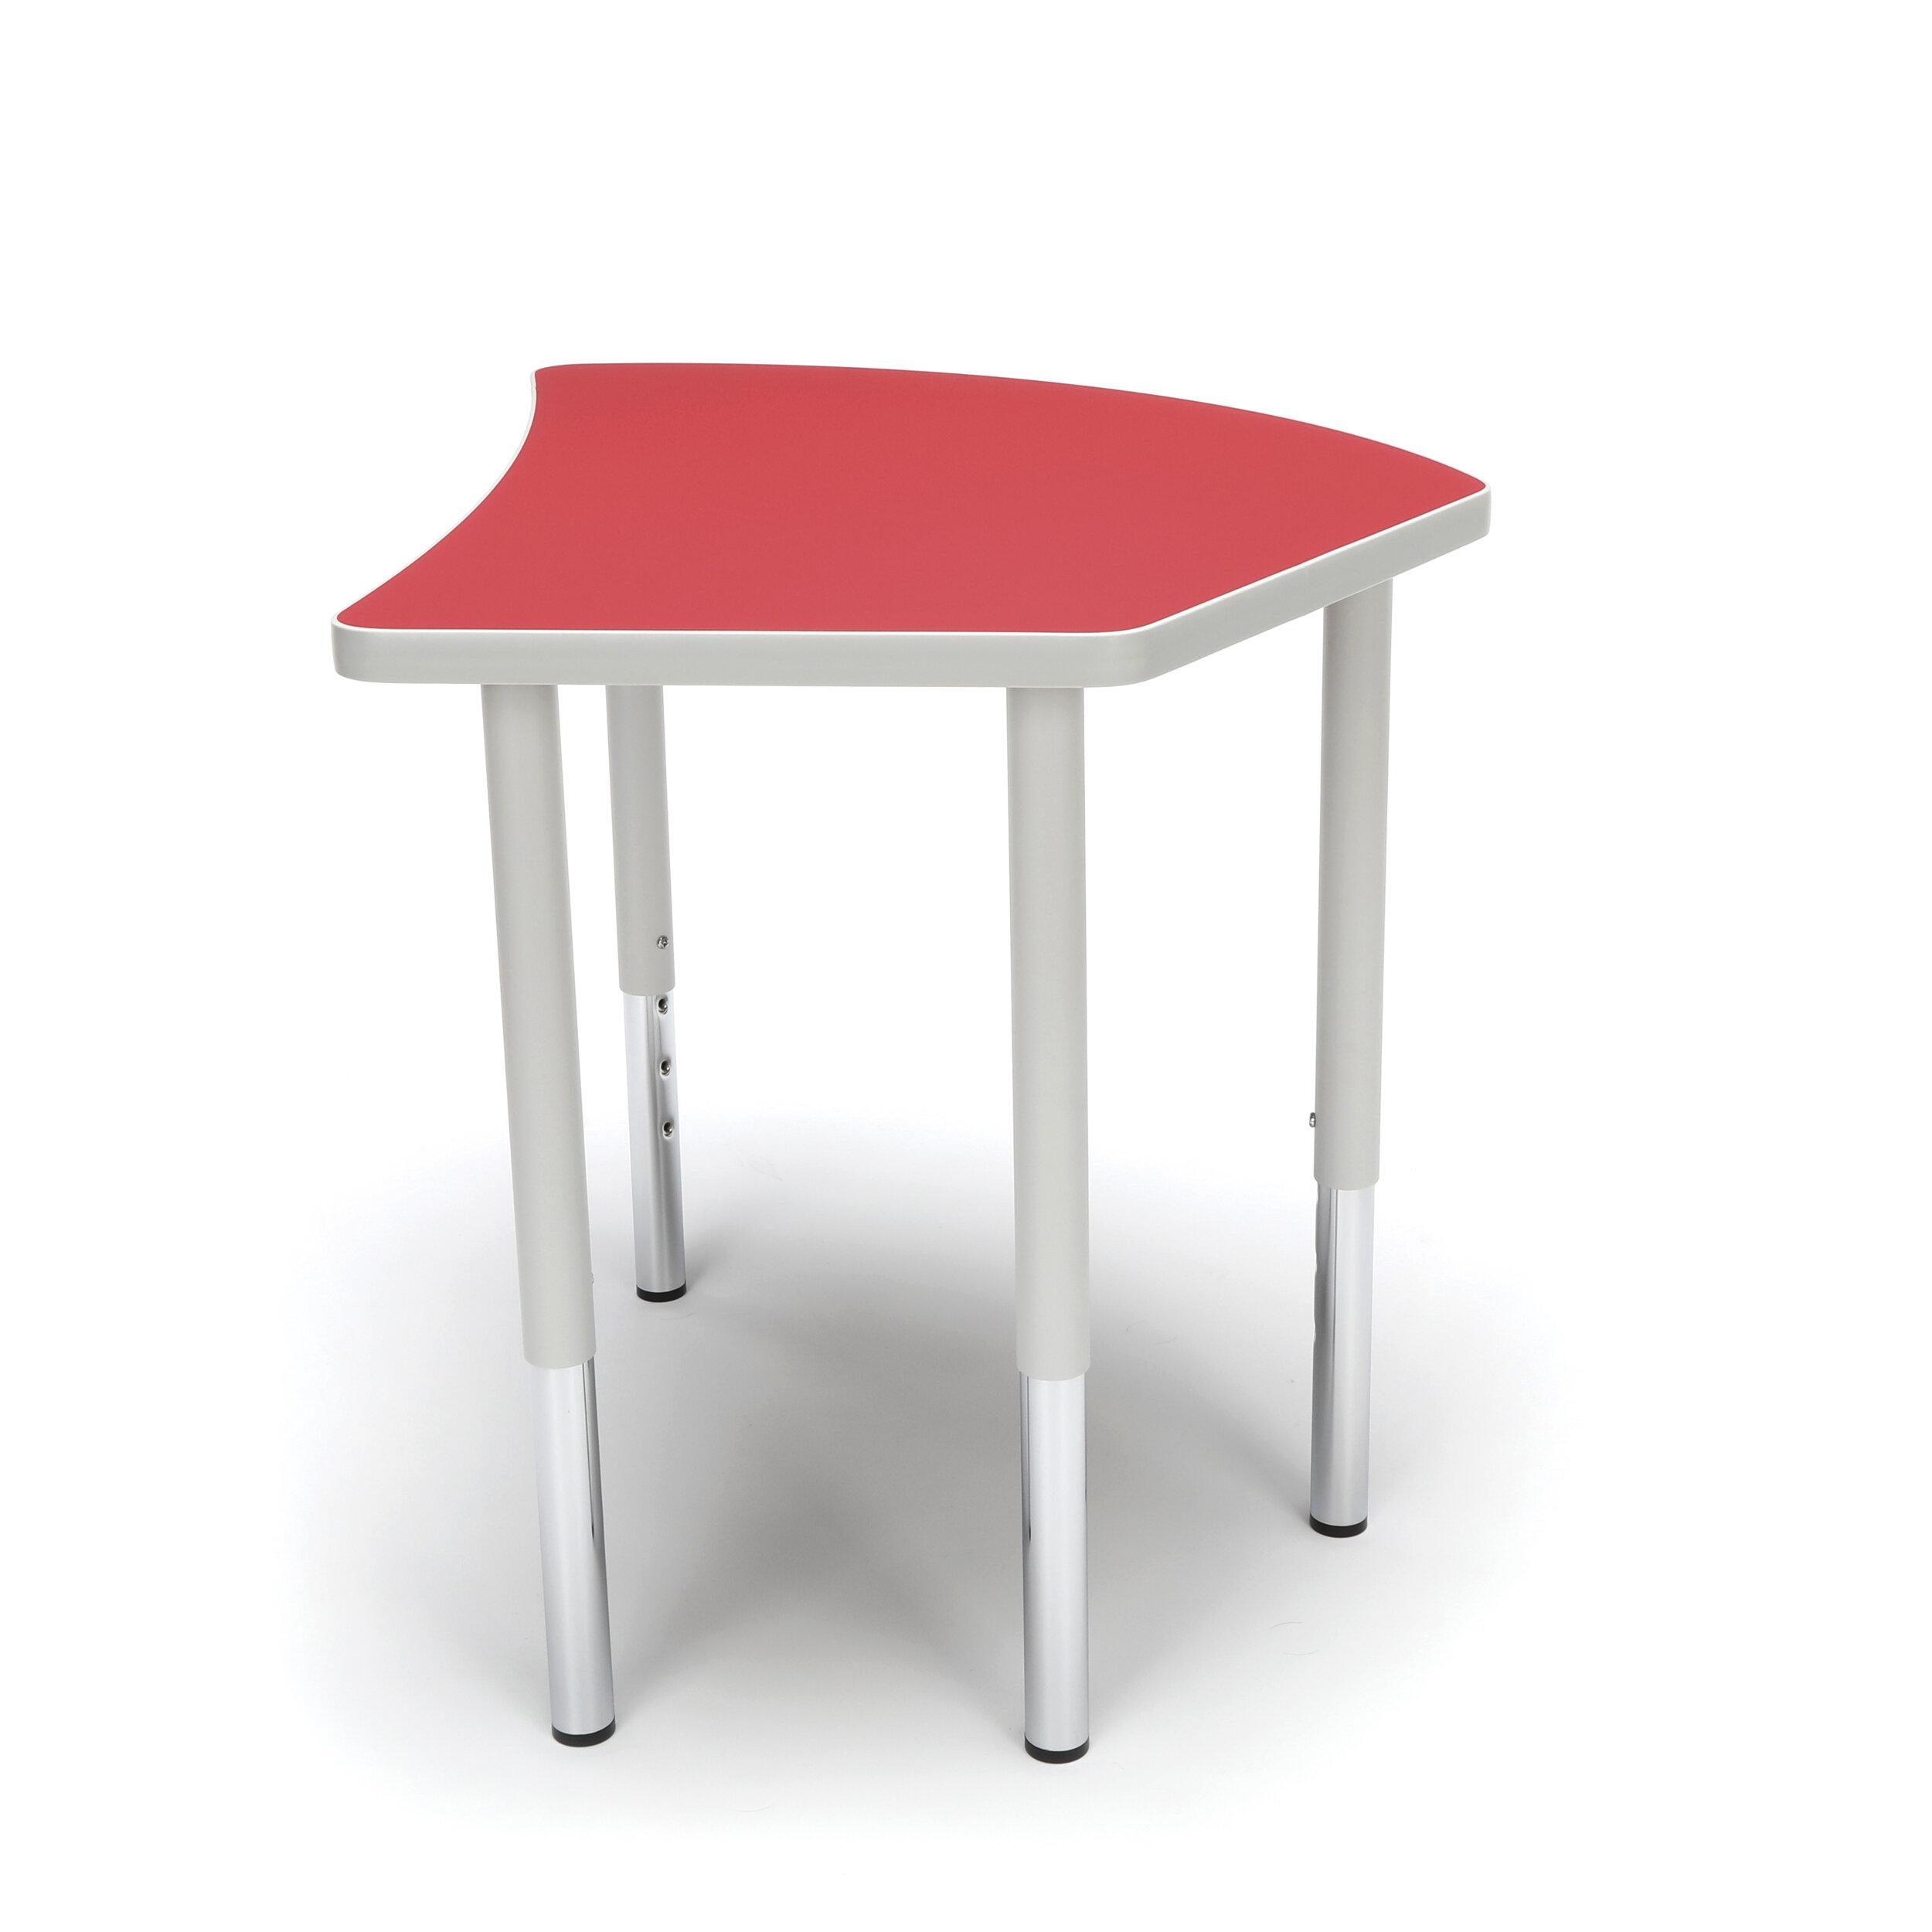 Ofm Adapt Series Crescent Adjustable 30 75 X 25 75 Novelty Activity Table Wayfair